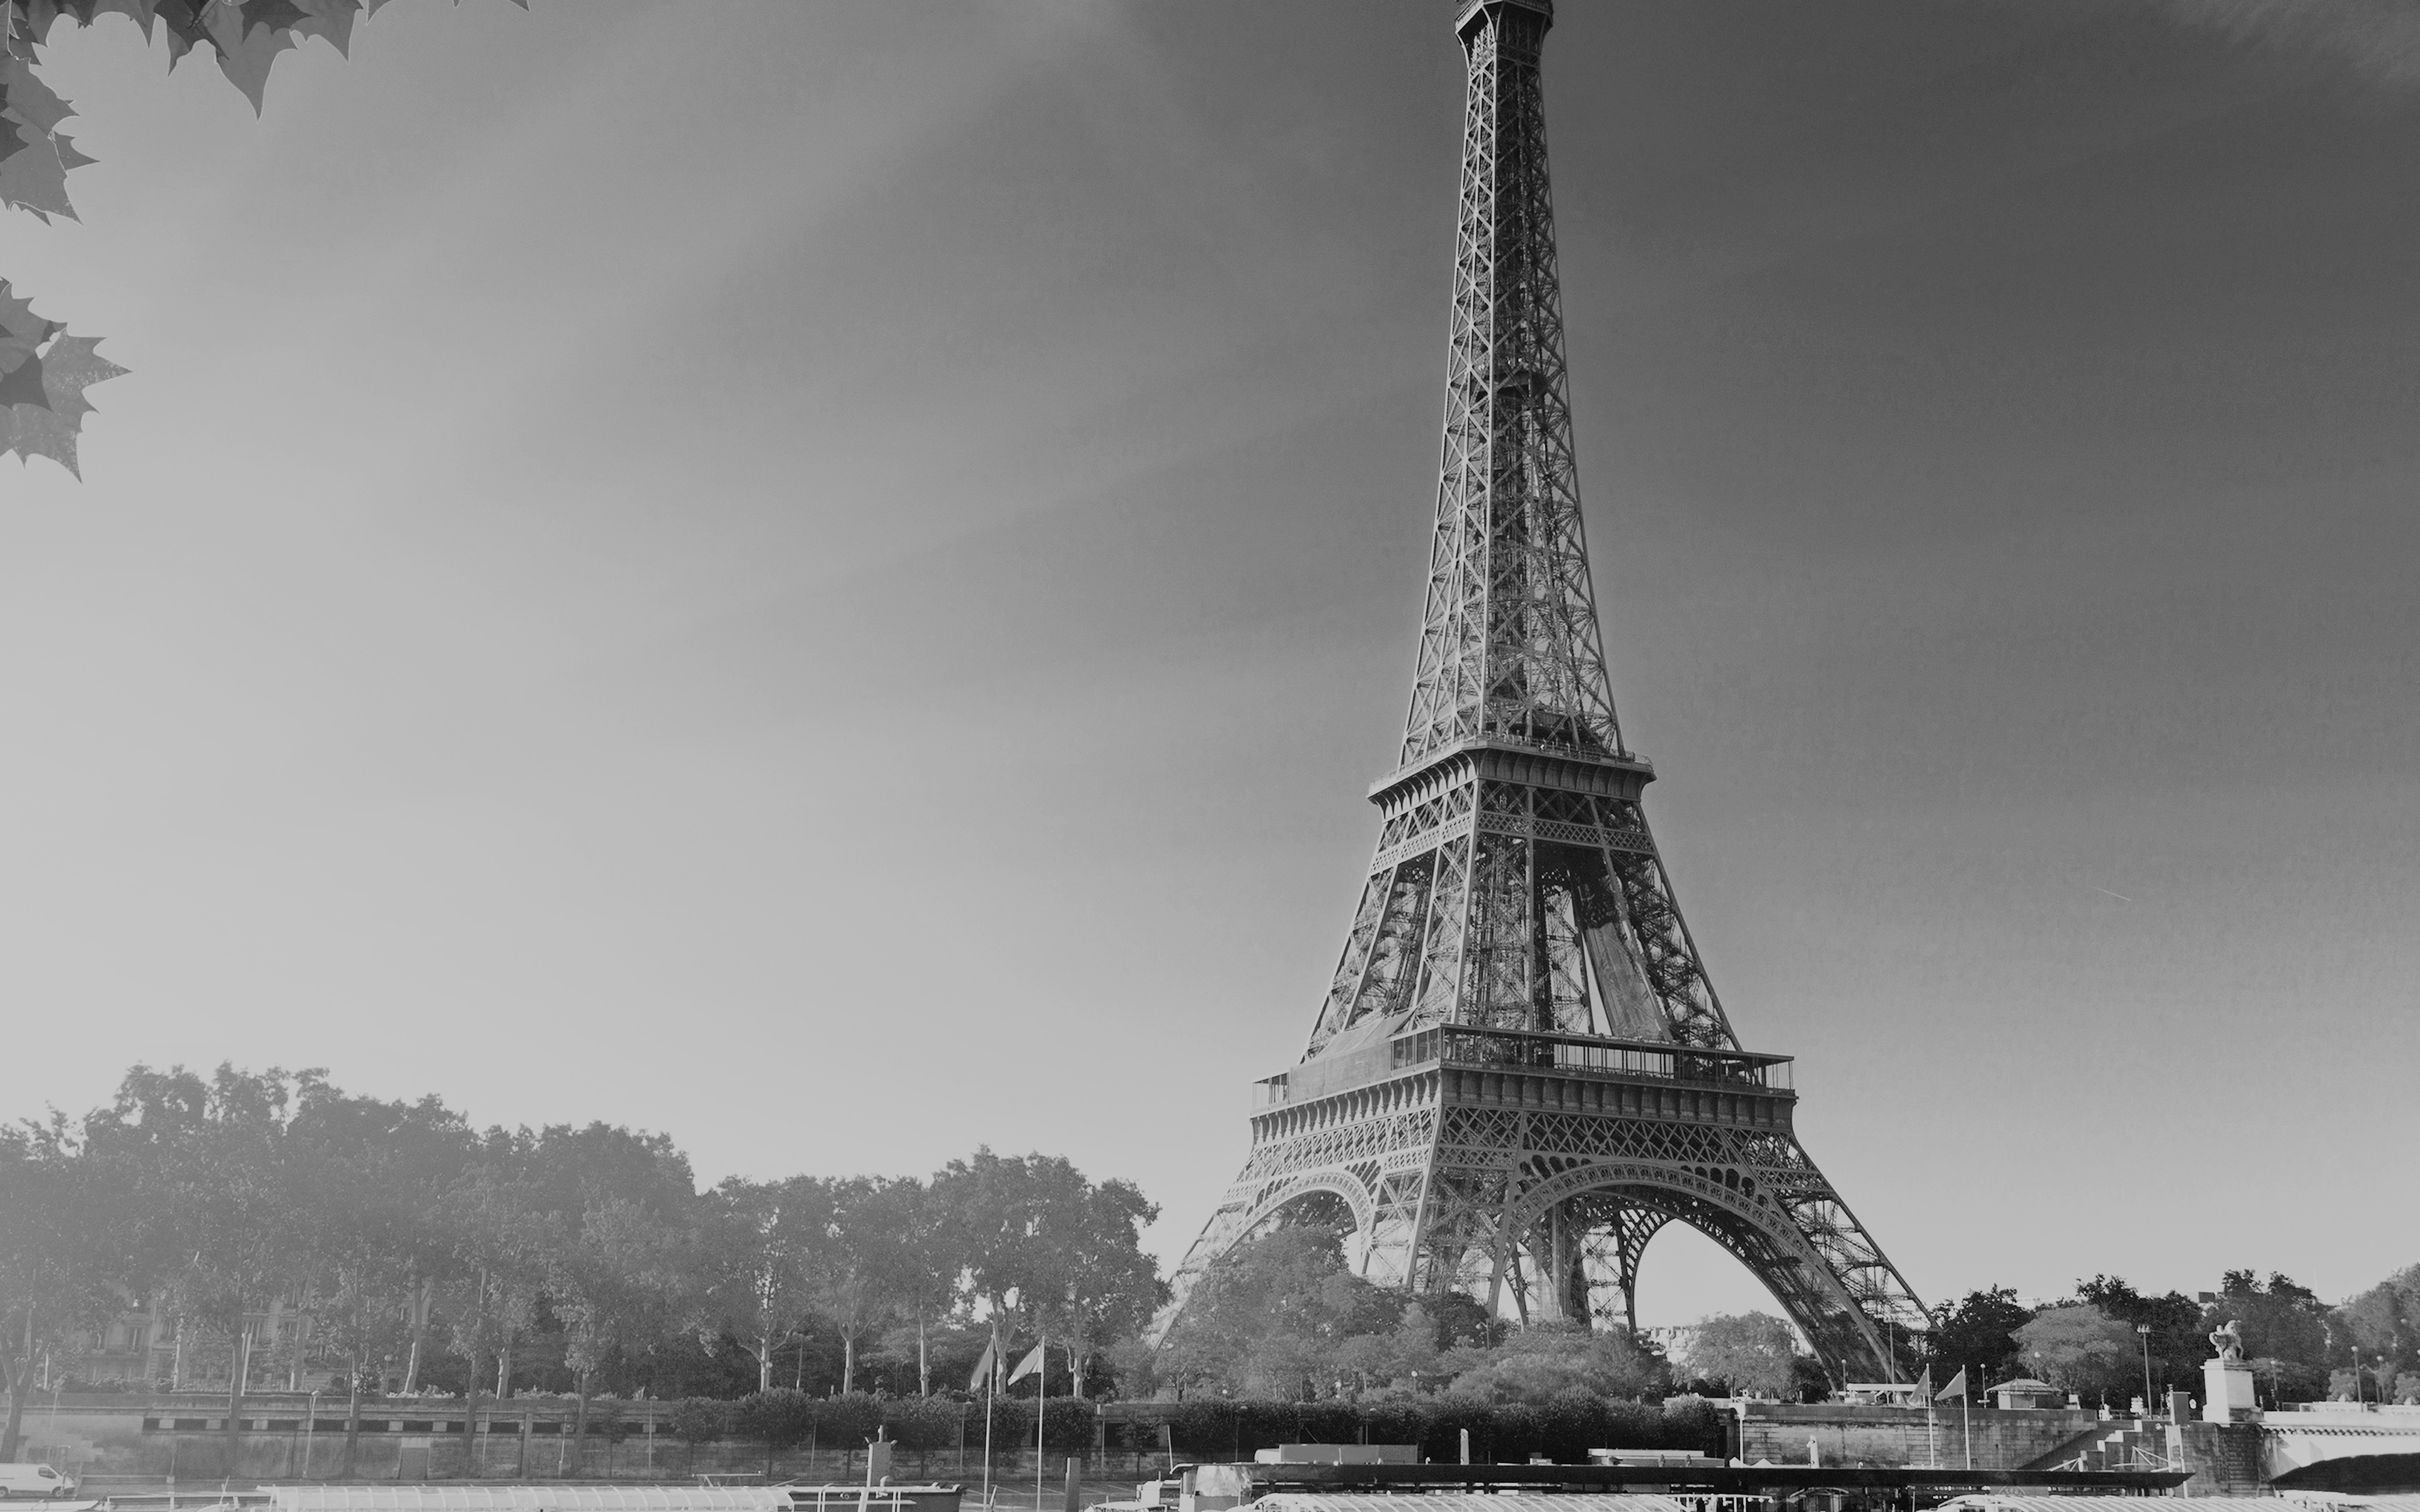 Na18 Sky Dark Bw Eiffel Tower Nature Paris City Wallpaper